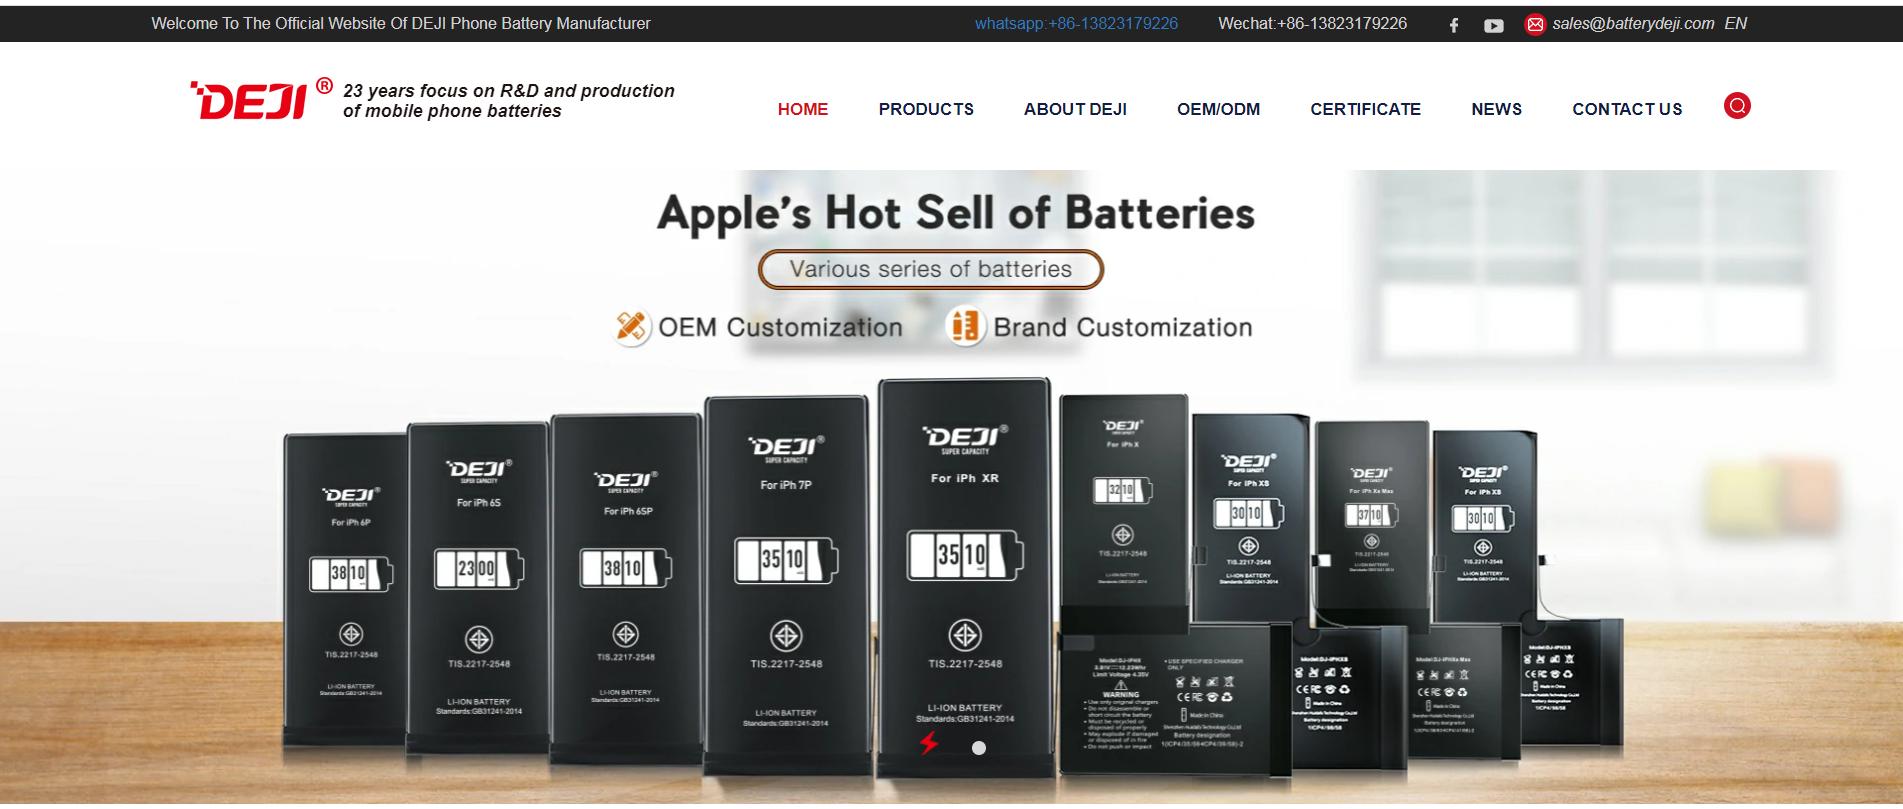 DEJI battery official website